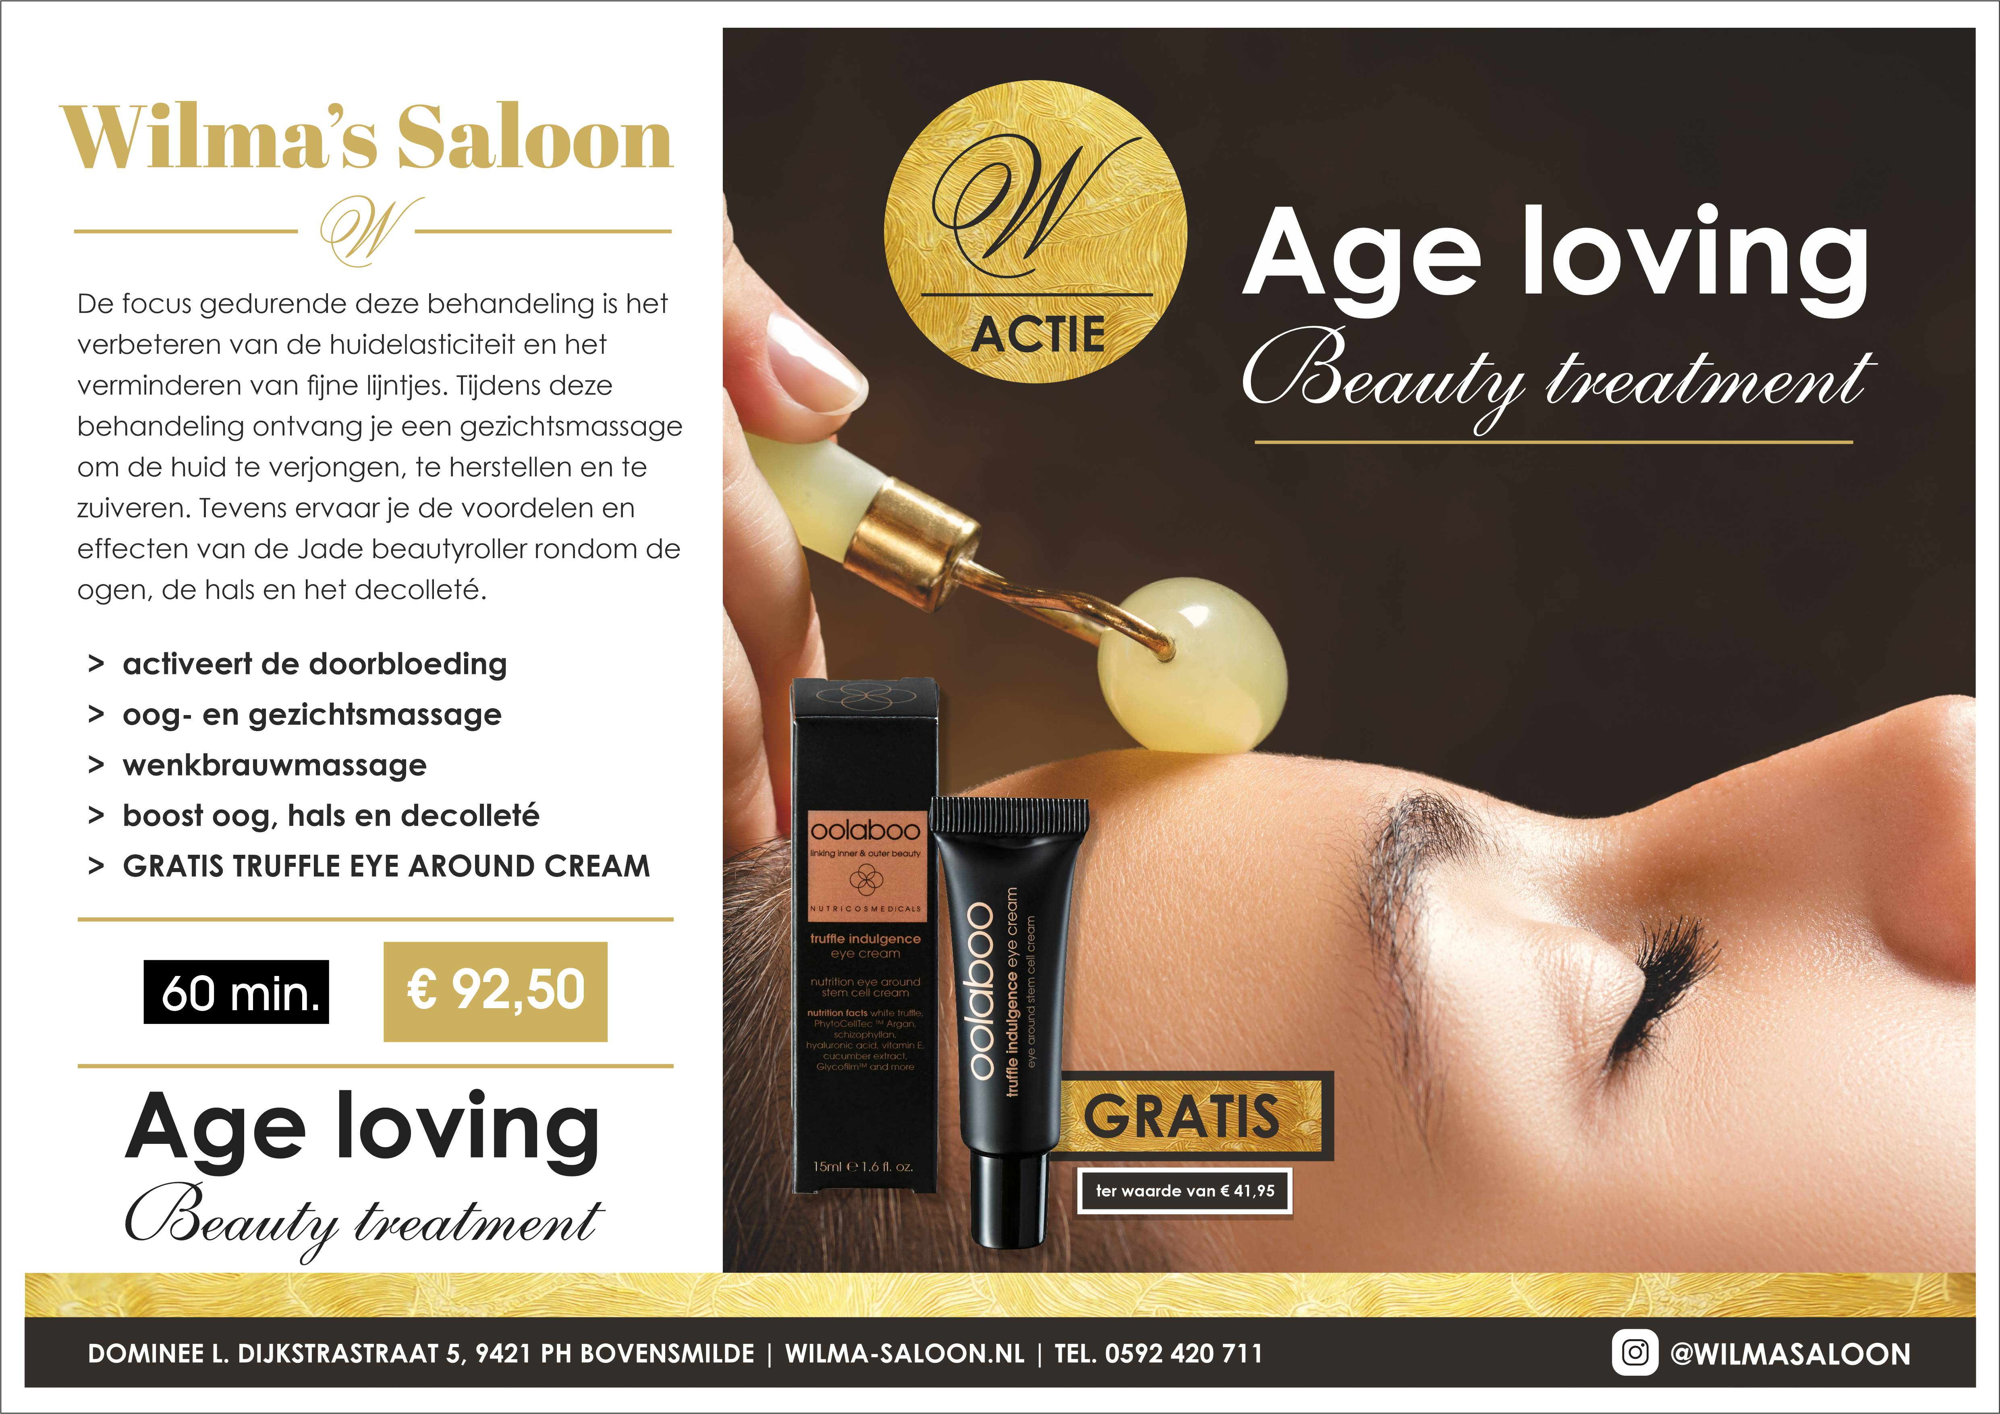 Age Loving Beauty Treatment